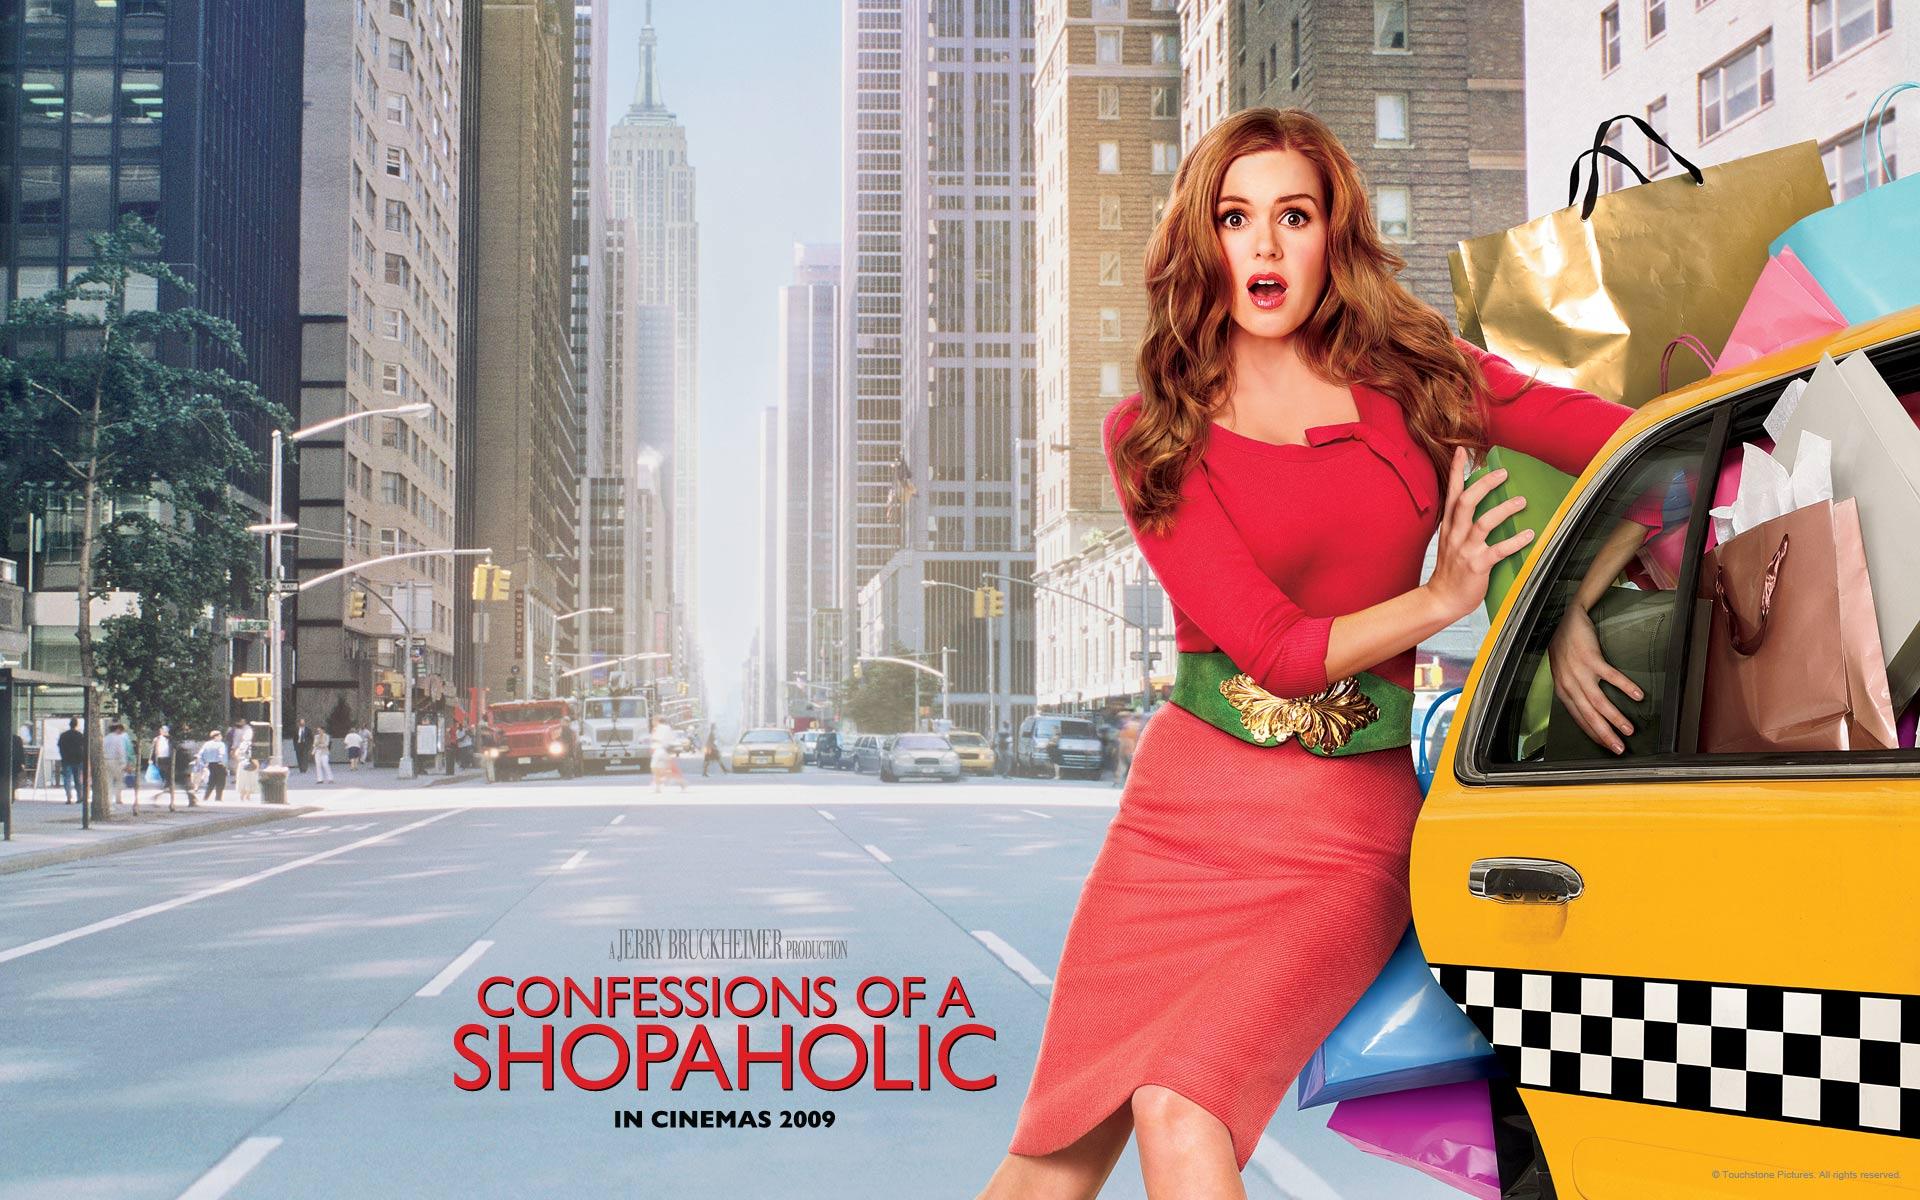 Shopaholic Rebecca and Confessions of a Shopaholic